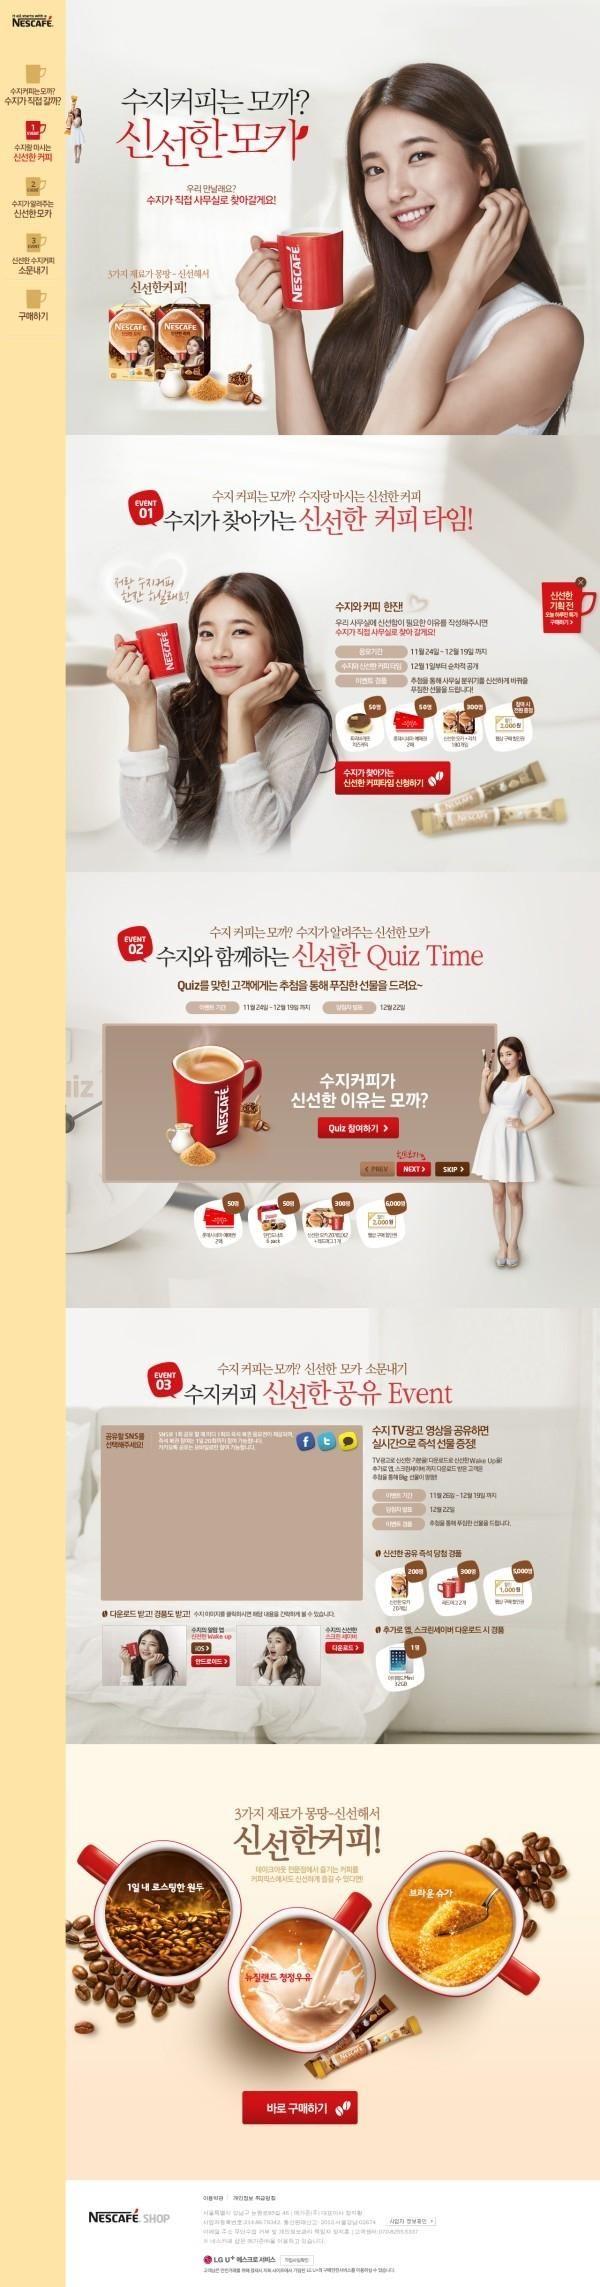 Screenshot http://freshmix.nescafe.co.kr/event/?utm_source=NaverCrossMedia&utm_medium=Software&utm_campaign=20141124_suzyMocha#event01 - created via http://pinthemall.net